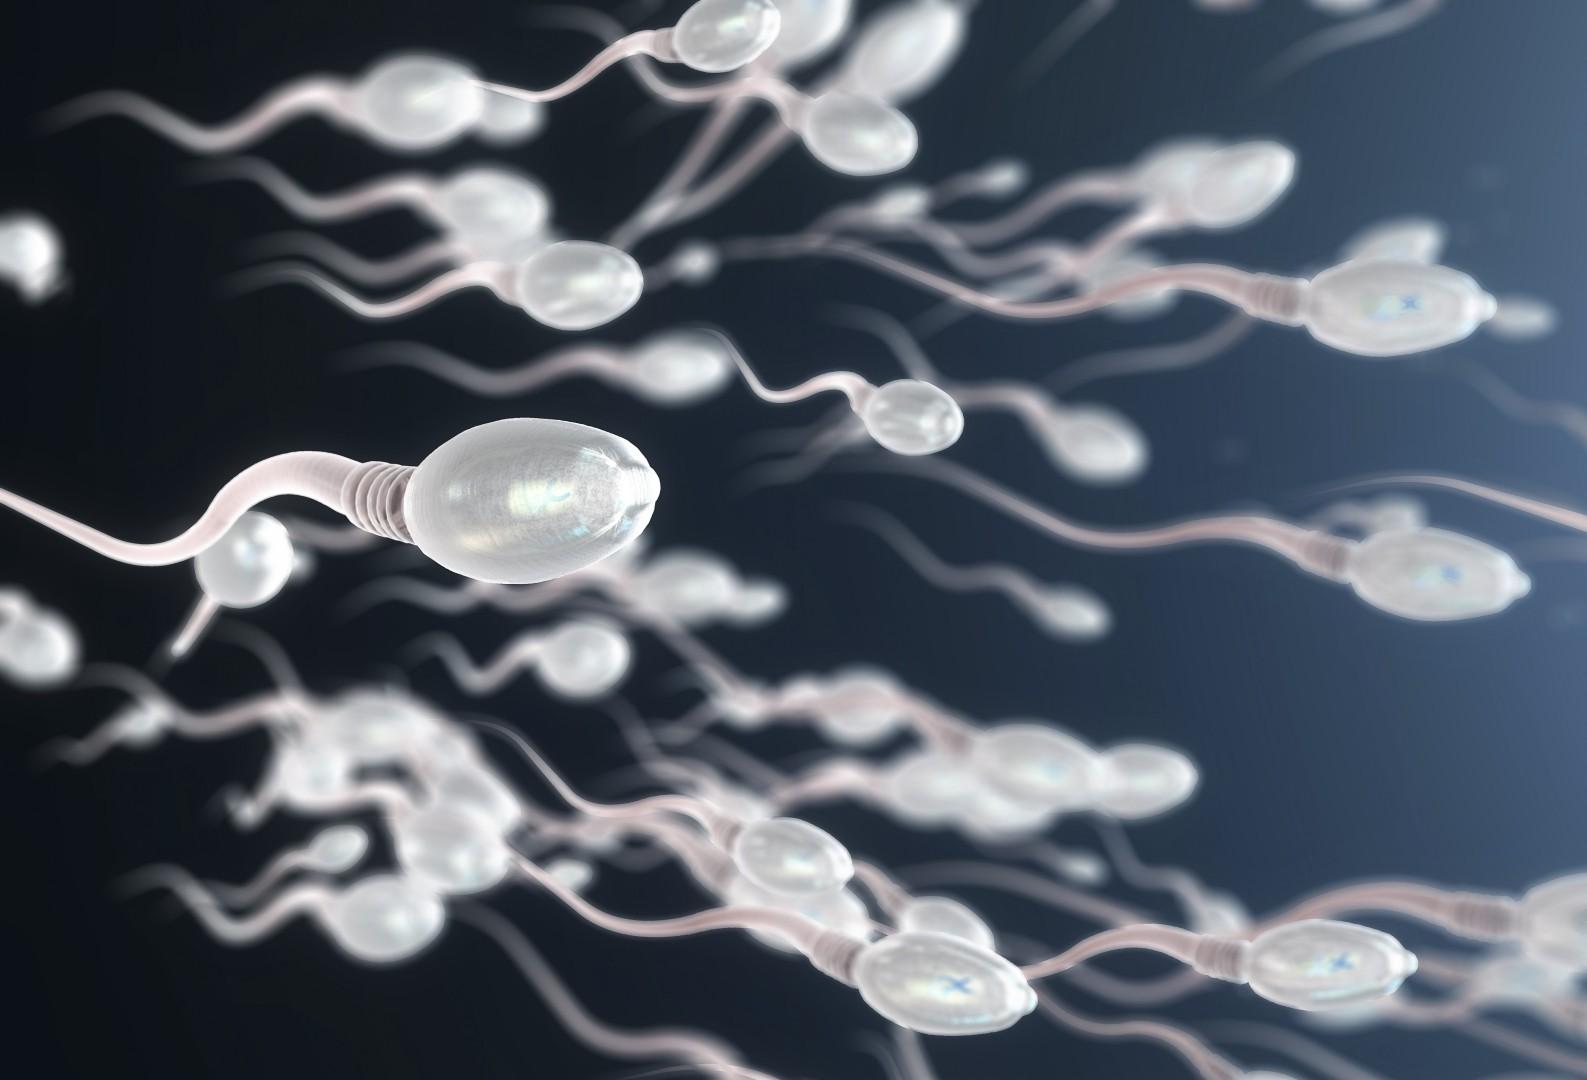 Master sperm silver the